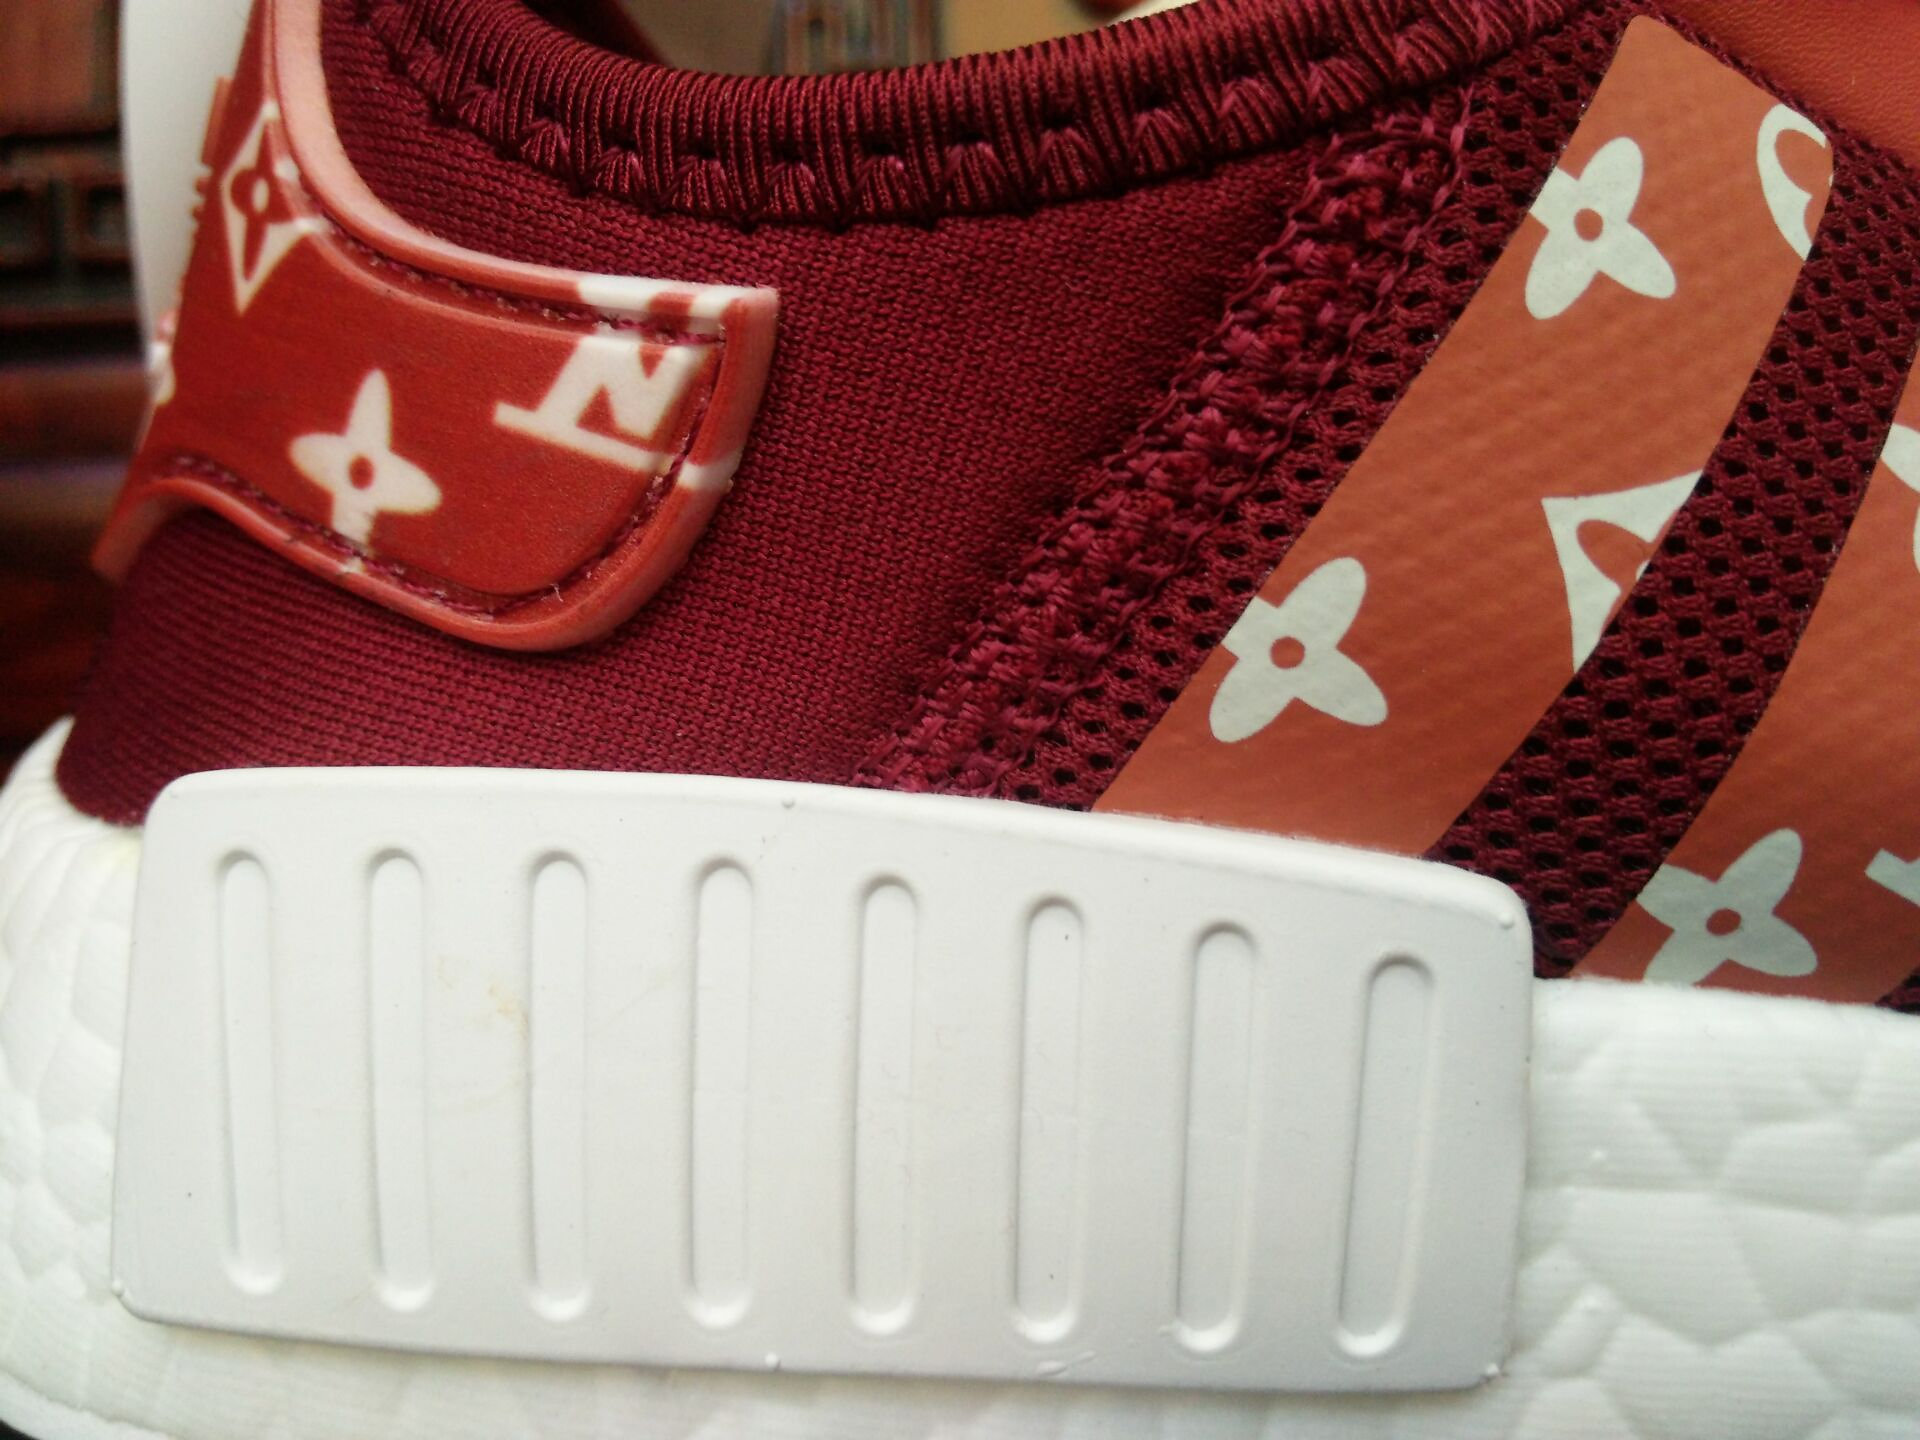 Buy Cheap Supreme x LV x Adidas NMD R1 Red Shoes Sale 2018 a942e155b73